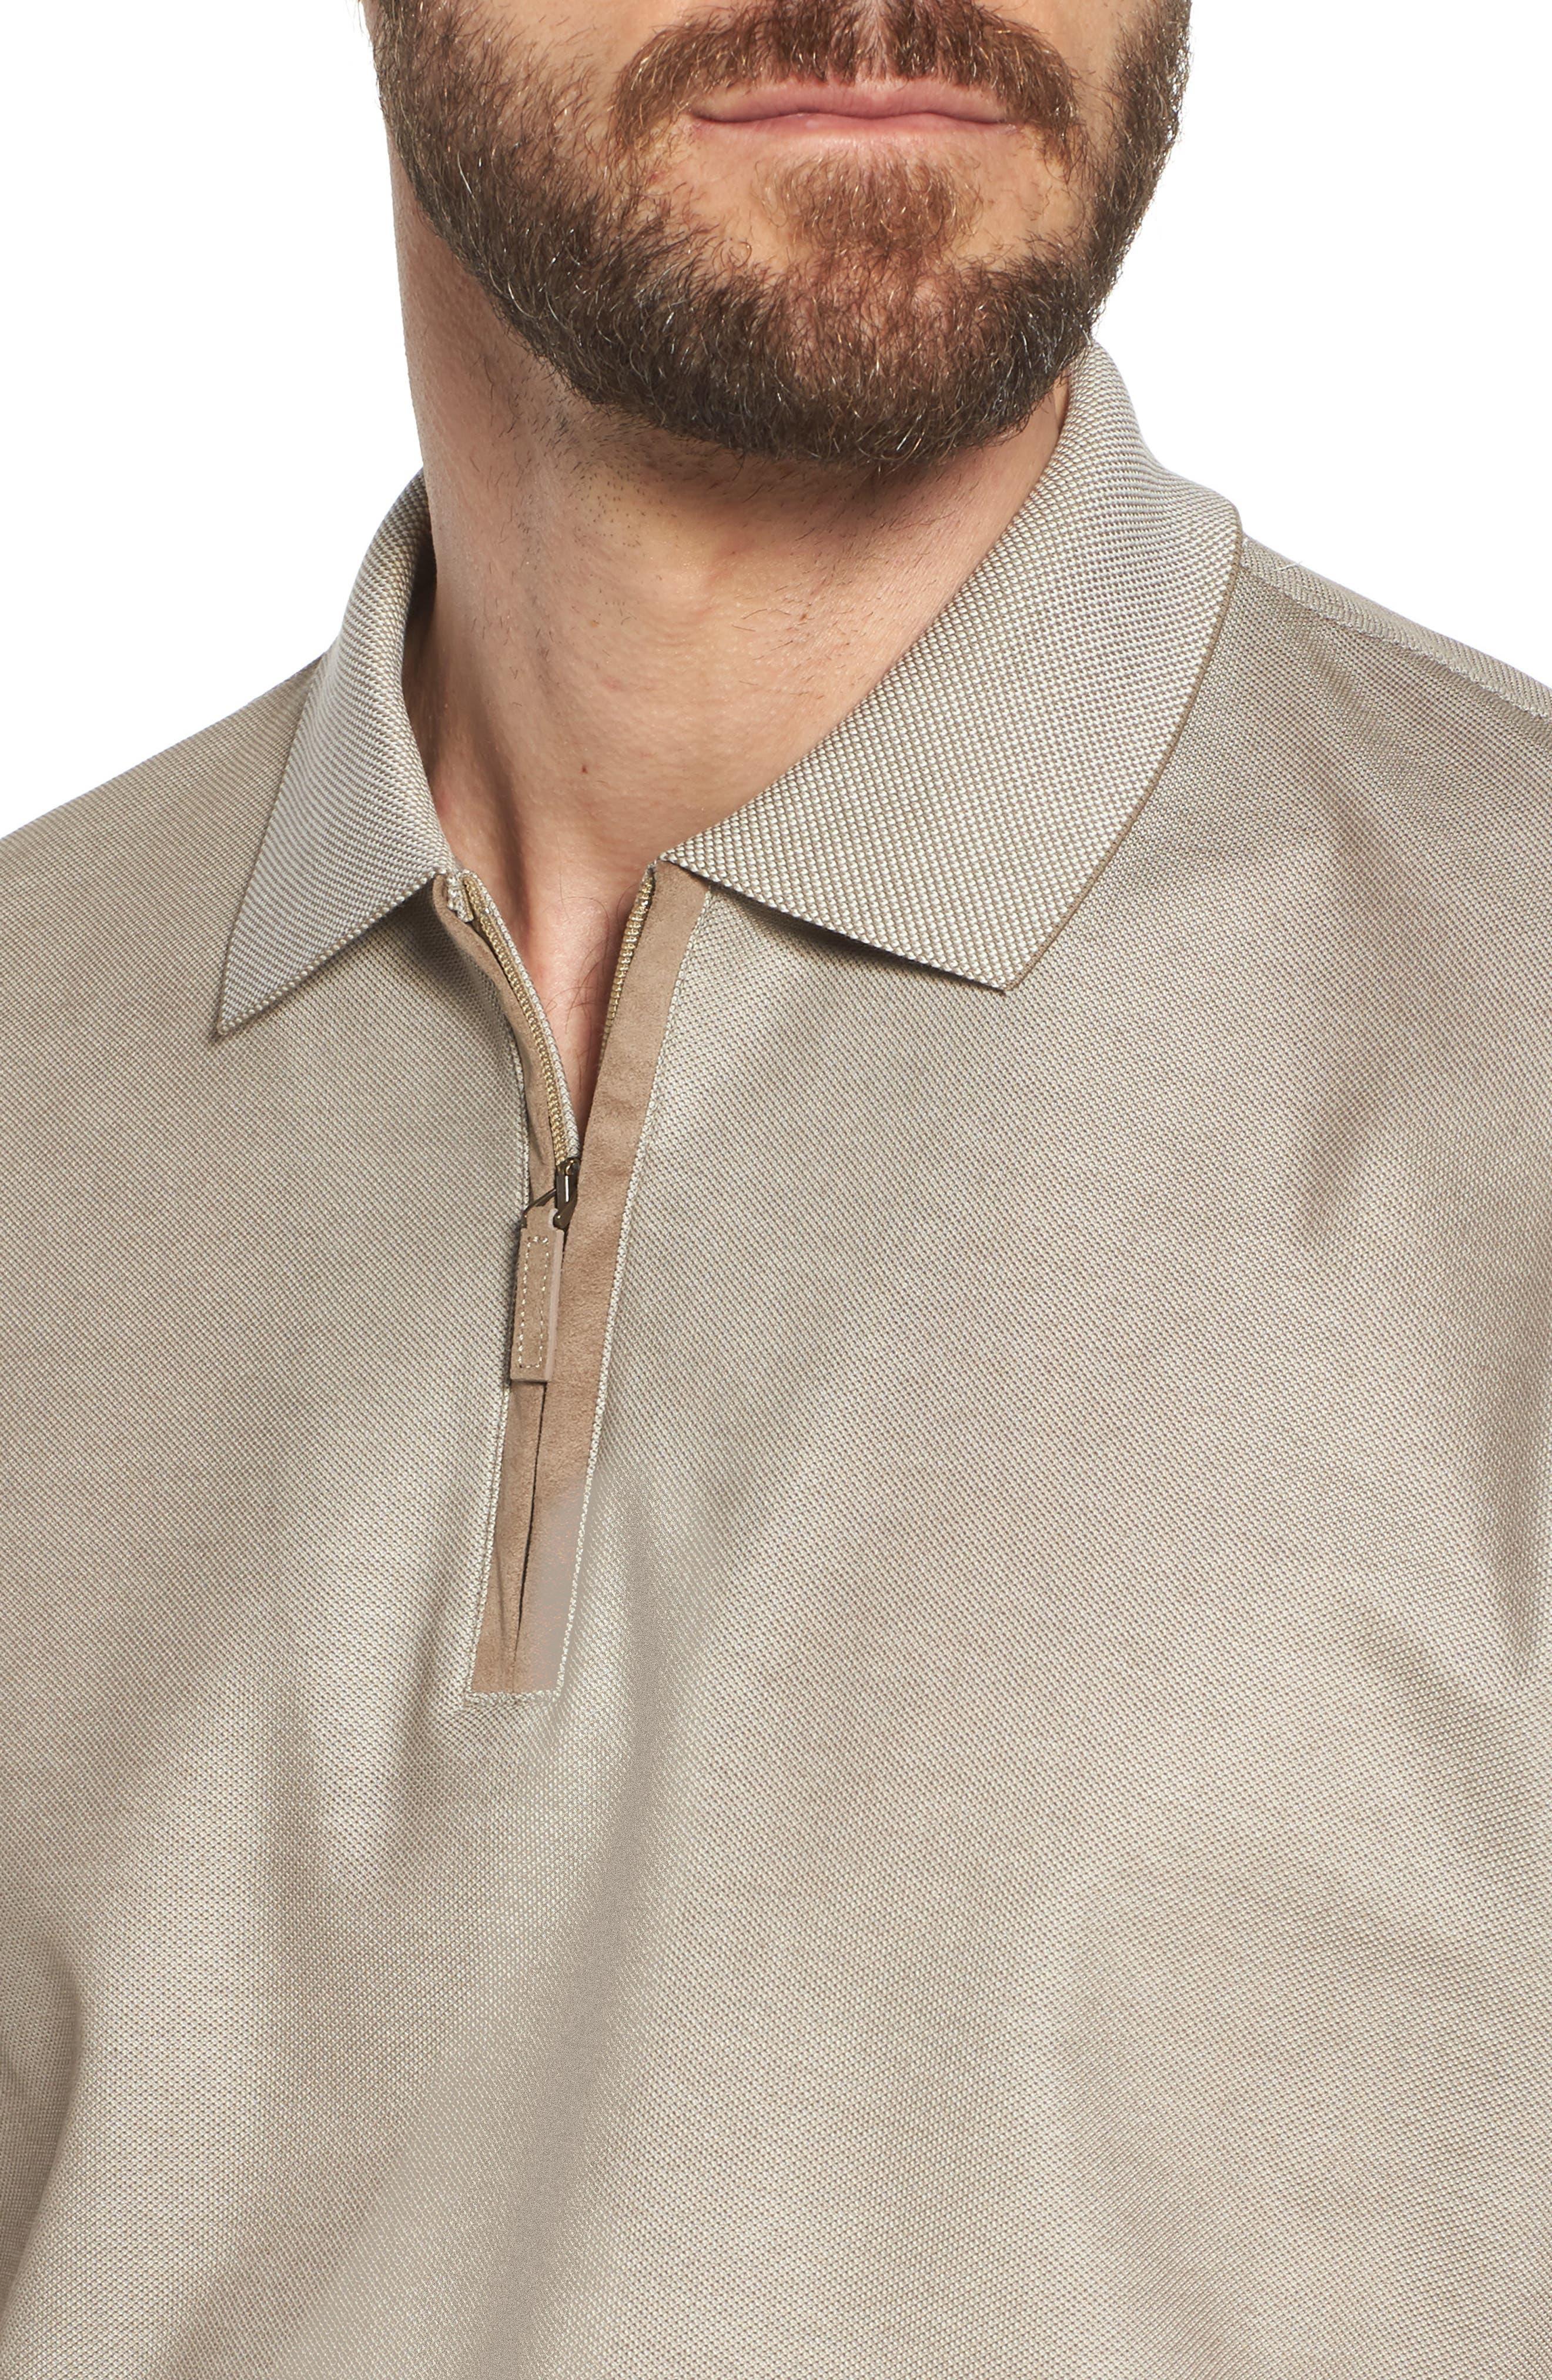 Cotton Polo Shirt,                             Alternate thumbnail 4, color,                             Tan